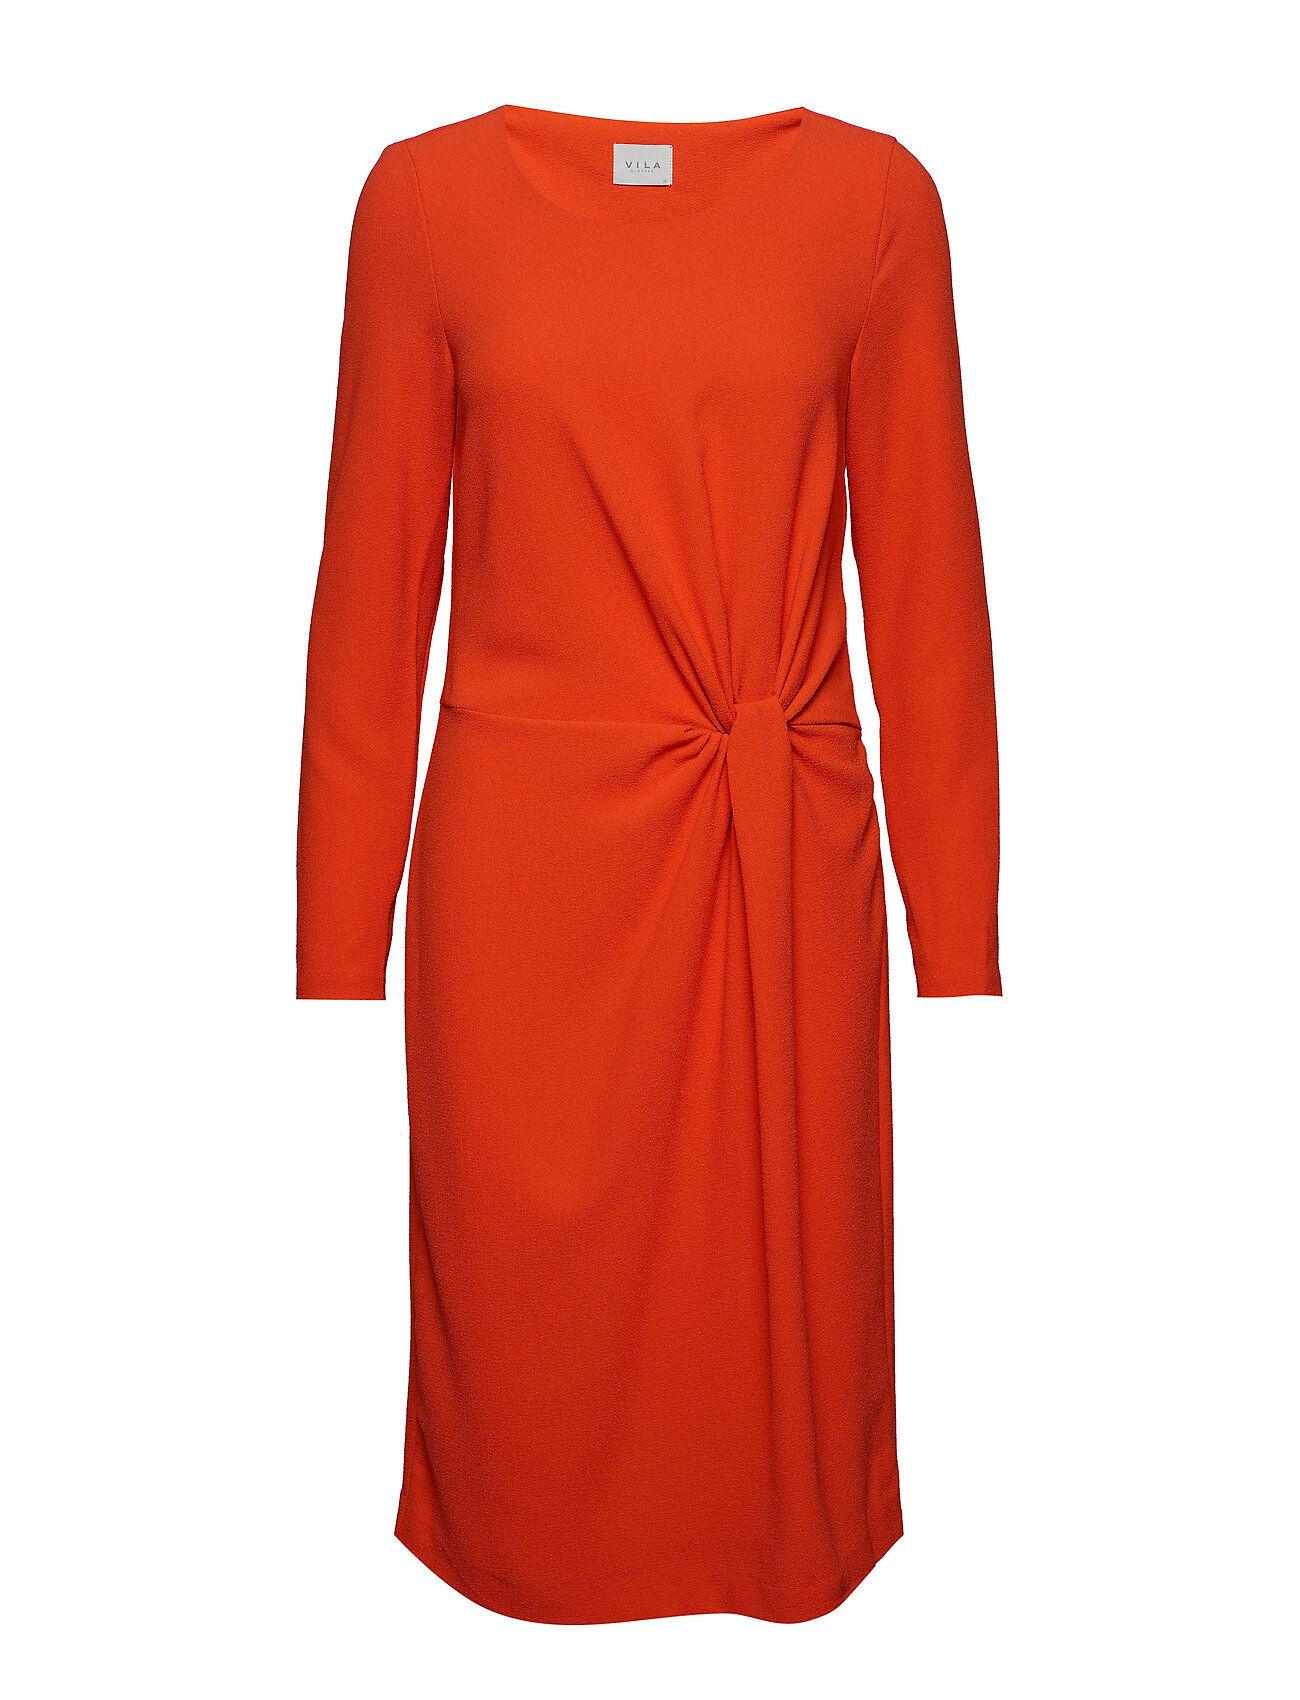 Image of VILA Visealo L/S Knot Dress Polvipituinen Mekko Oranssi VILA